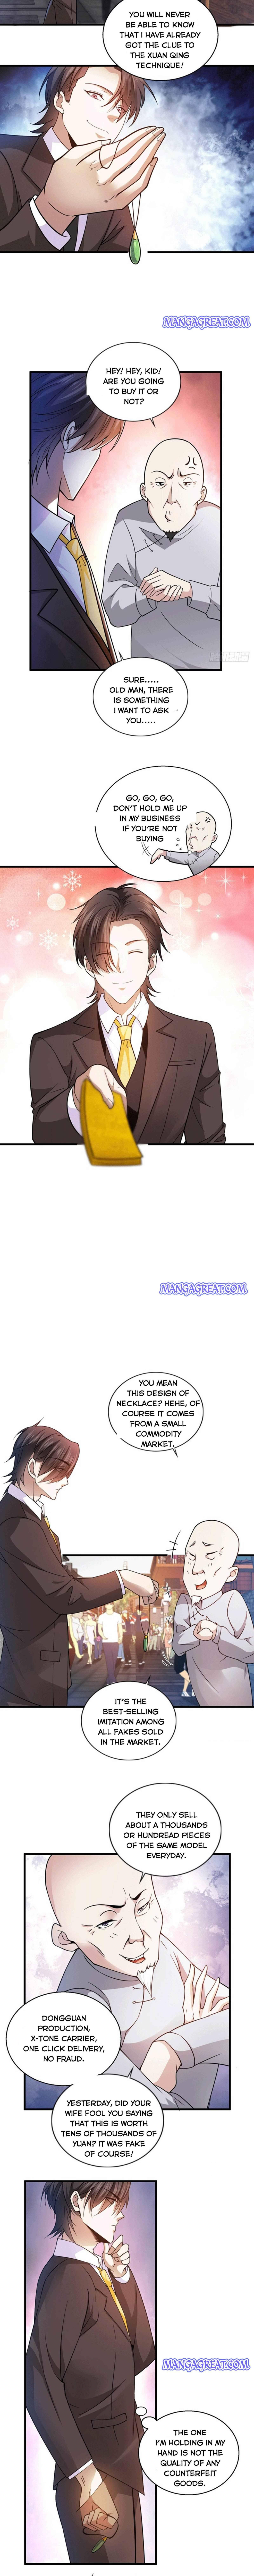 Dragon Son-In-Law God Of War Chapter 51 page 4 - Mangakakalots.com